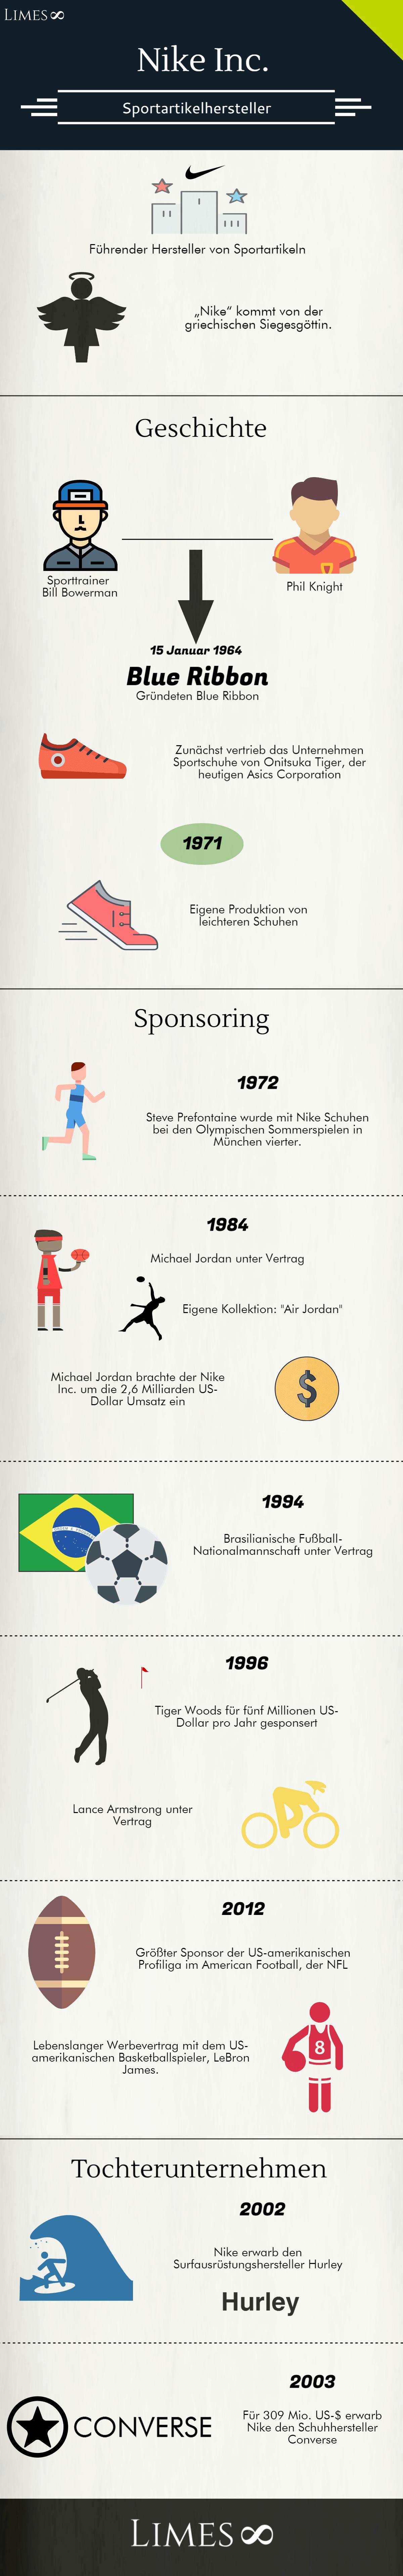 Infografik über die Nike Inc.